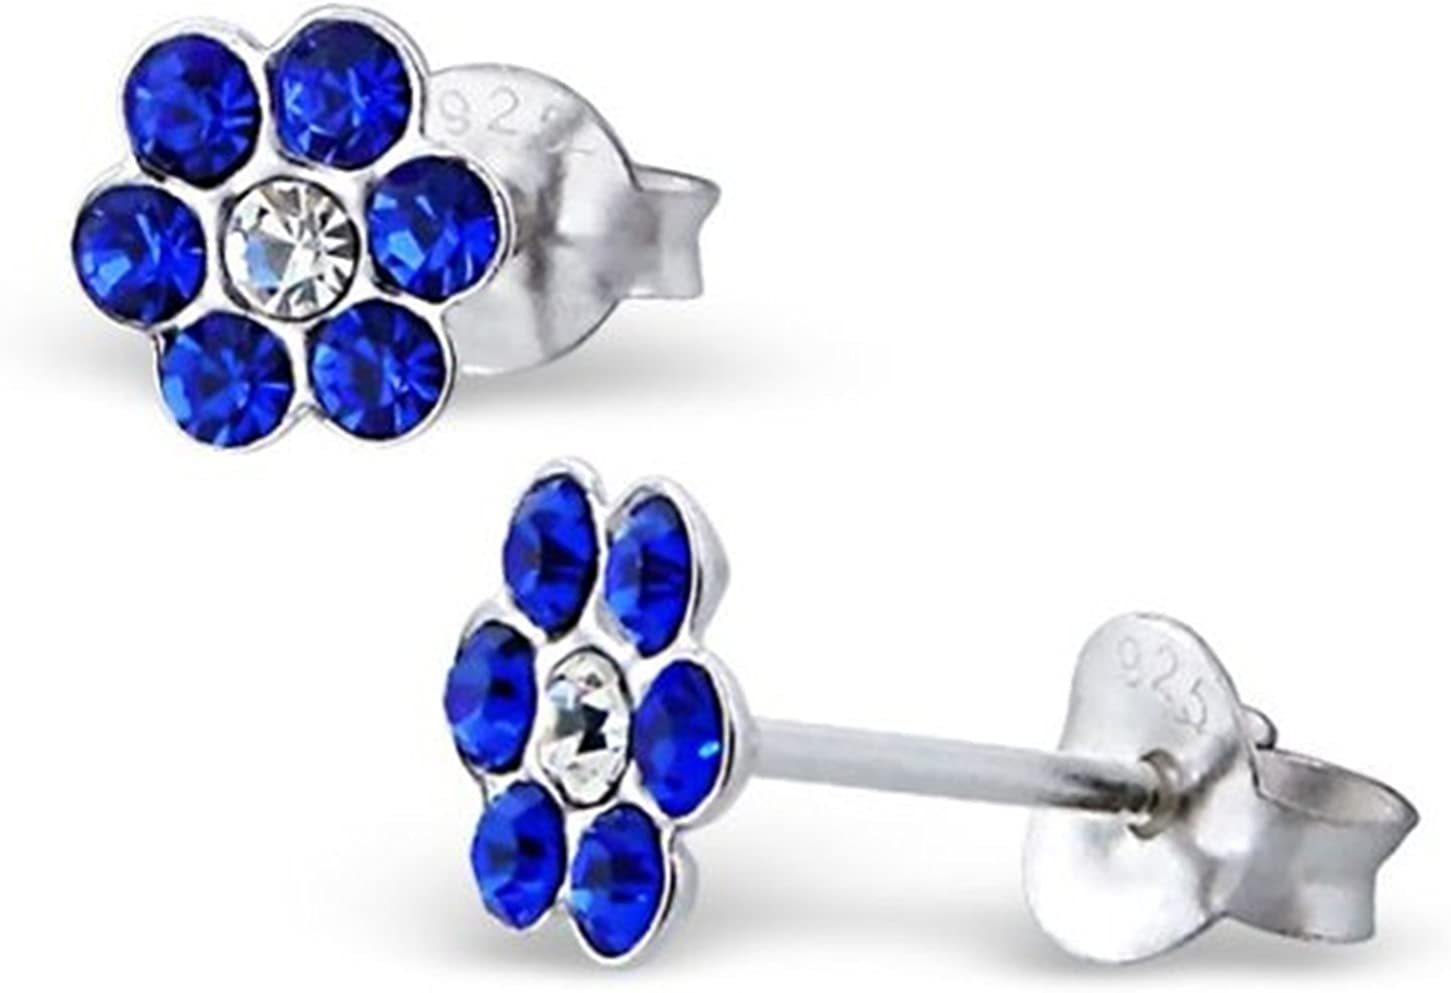 Katy Craig diseño de flores brillantes de plata de ley Juego de pendientes de tuerca con azul zafiro piedras de cristal